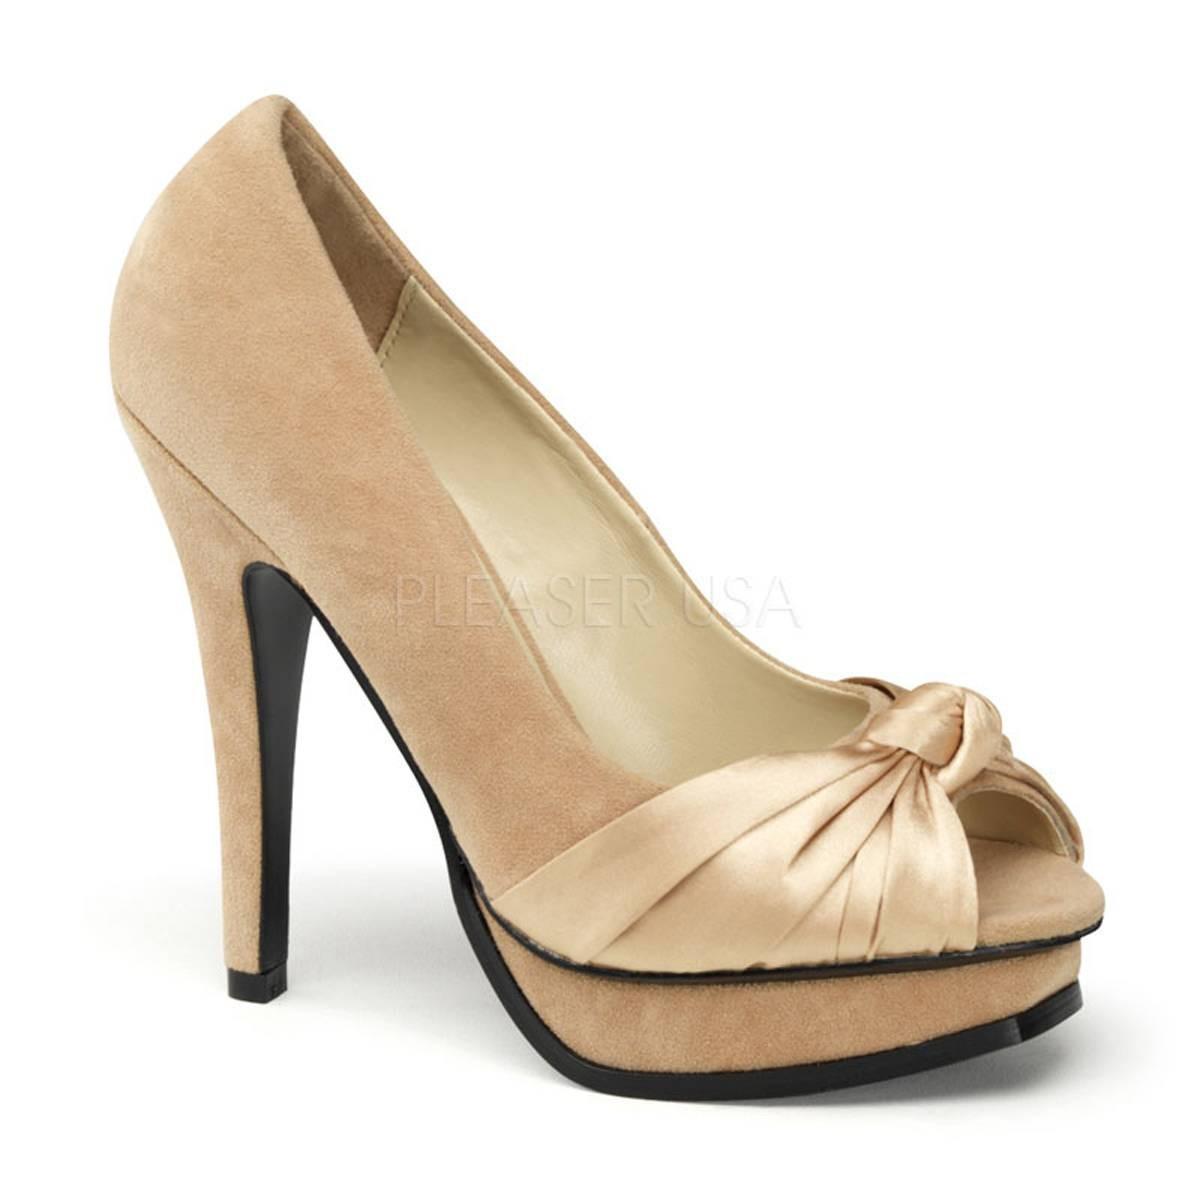 Highheels - PLEASURE 05 ° Damen Peep Toe ° Elfenbein Satin ° Pin Up Couture  - Onlineshop RedSixty